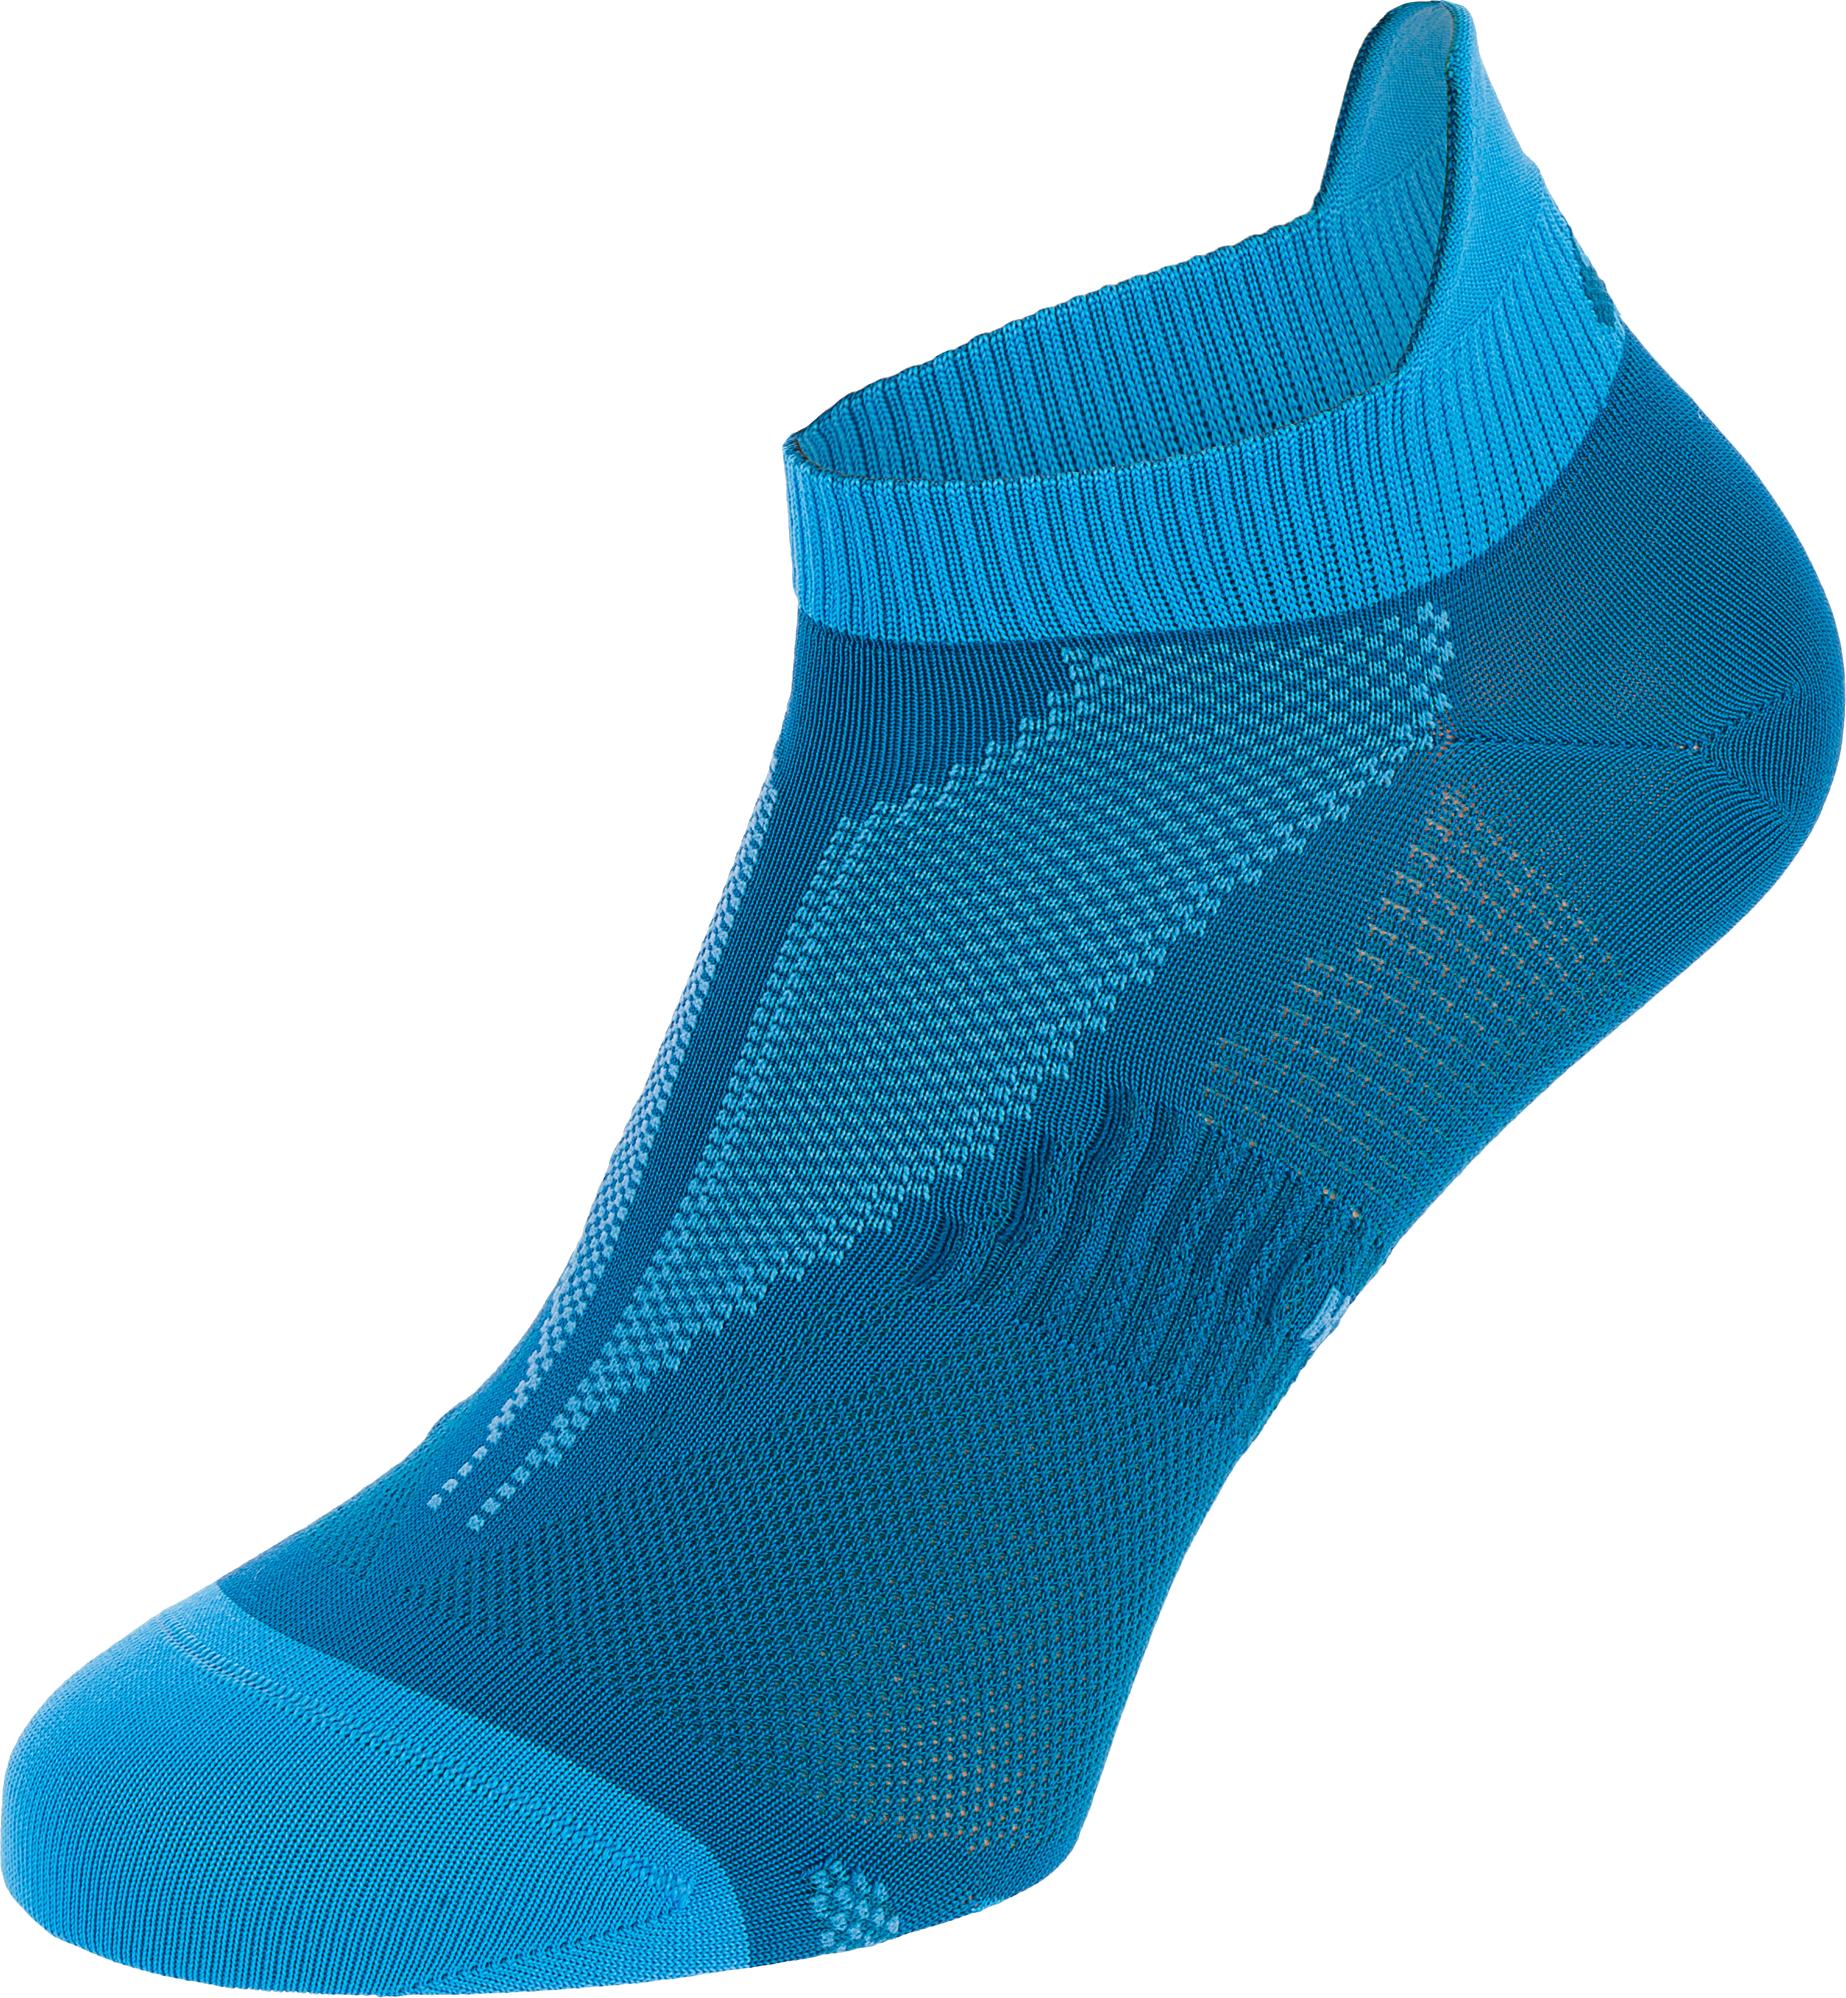 Clipart socks blue socks. Png images free download